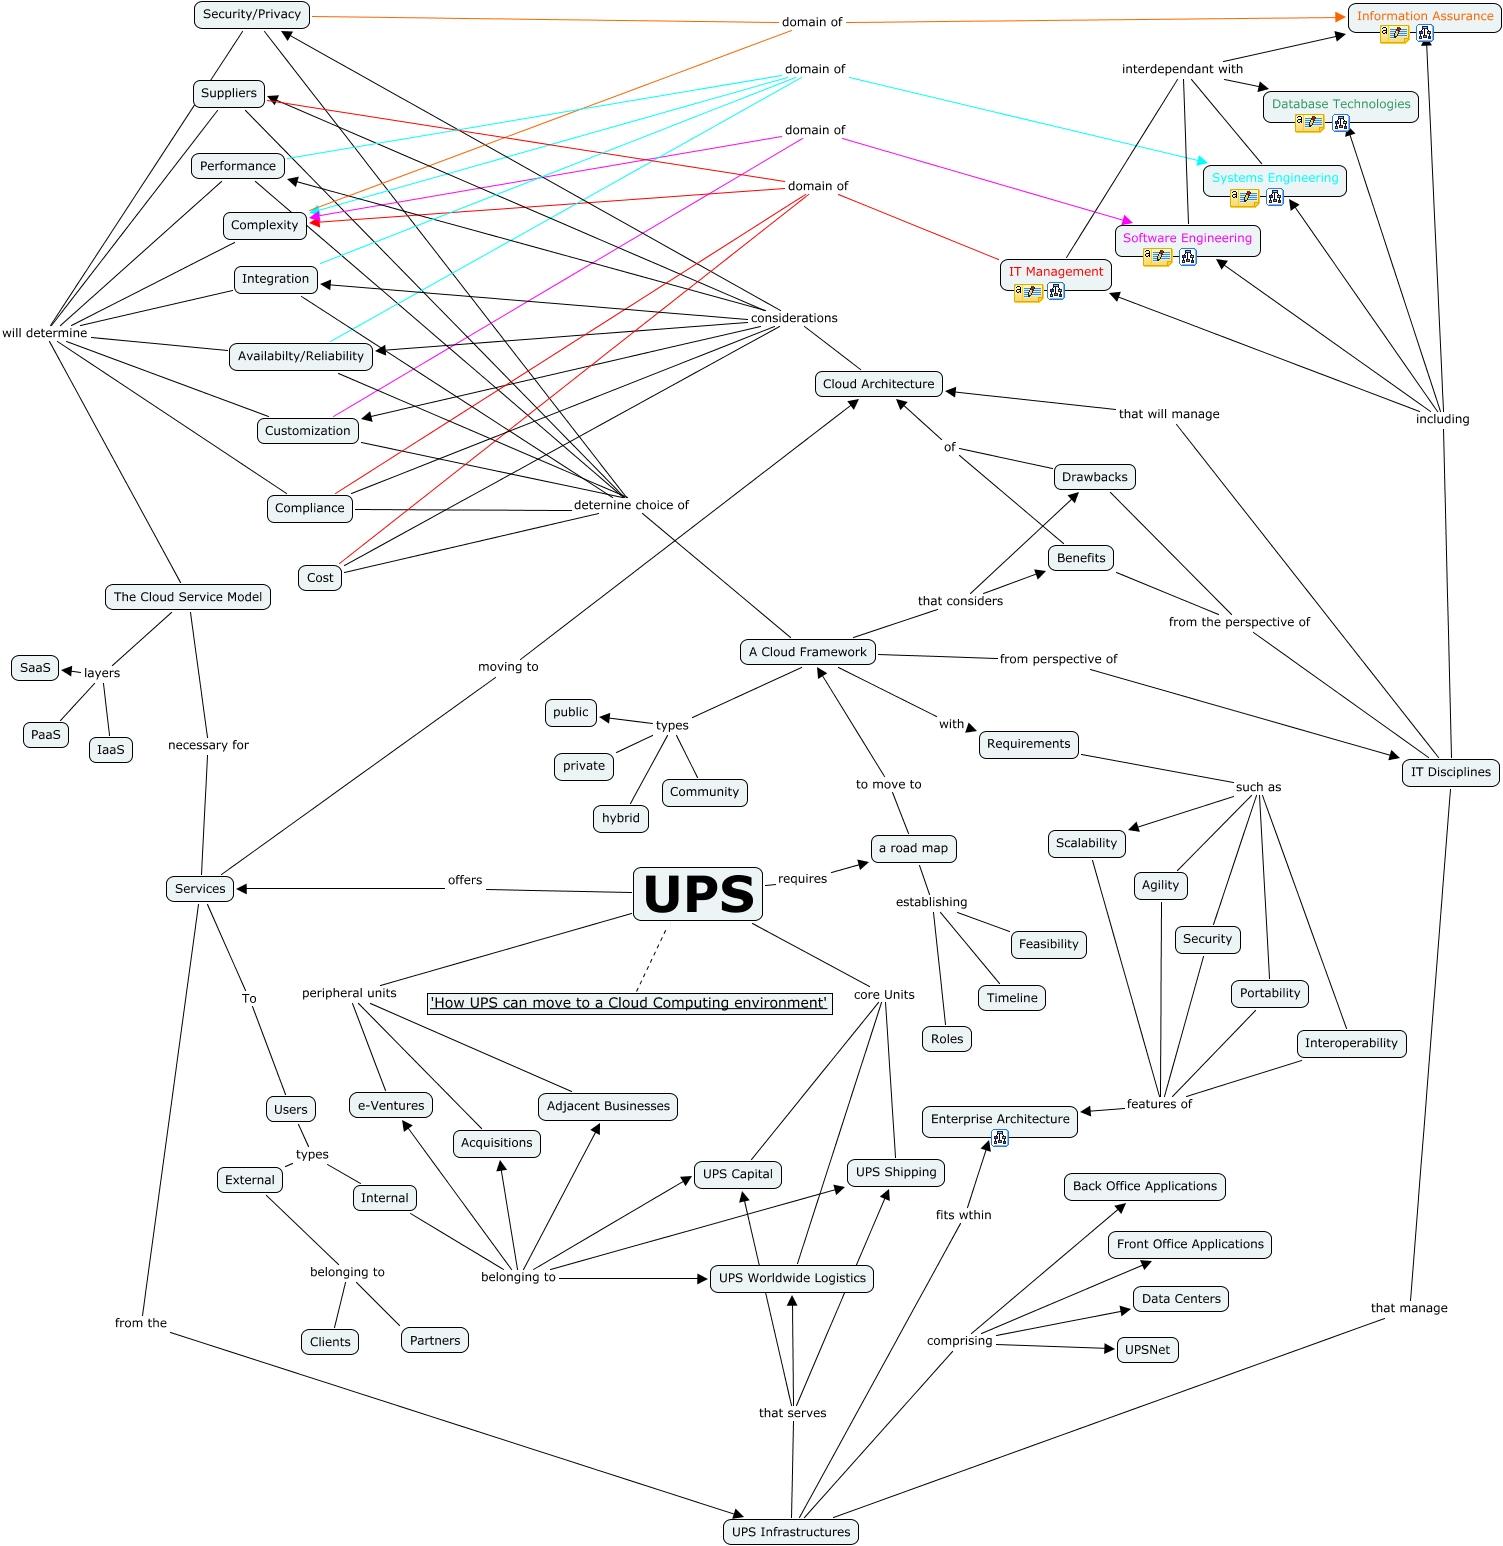 CMAP Core UPS Roadmap How UPS Can Move To A Cloud Computing - Roadmap of us